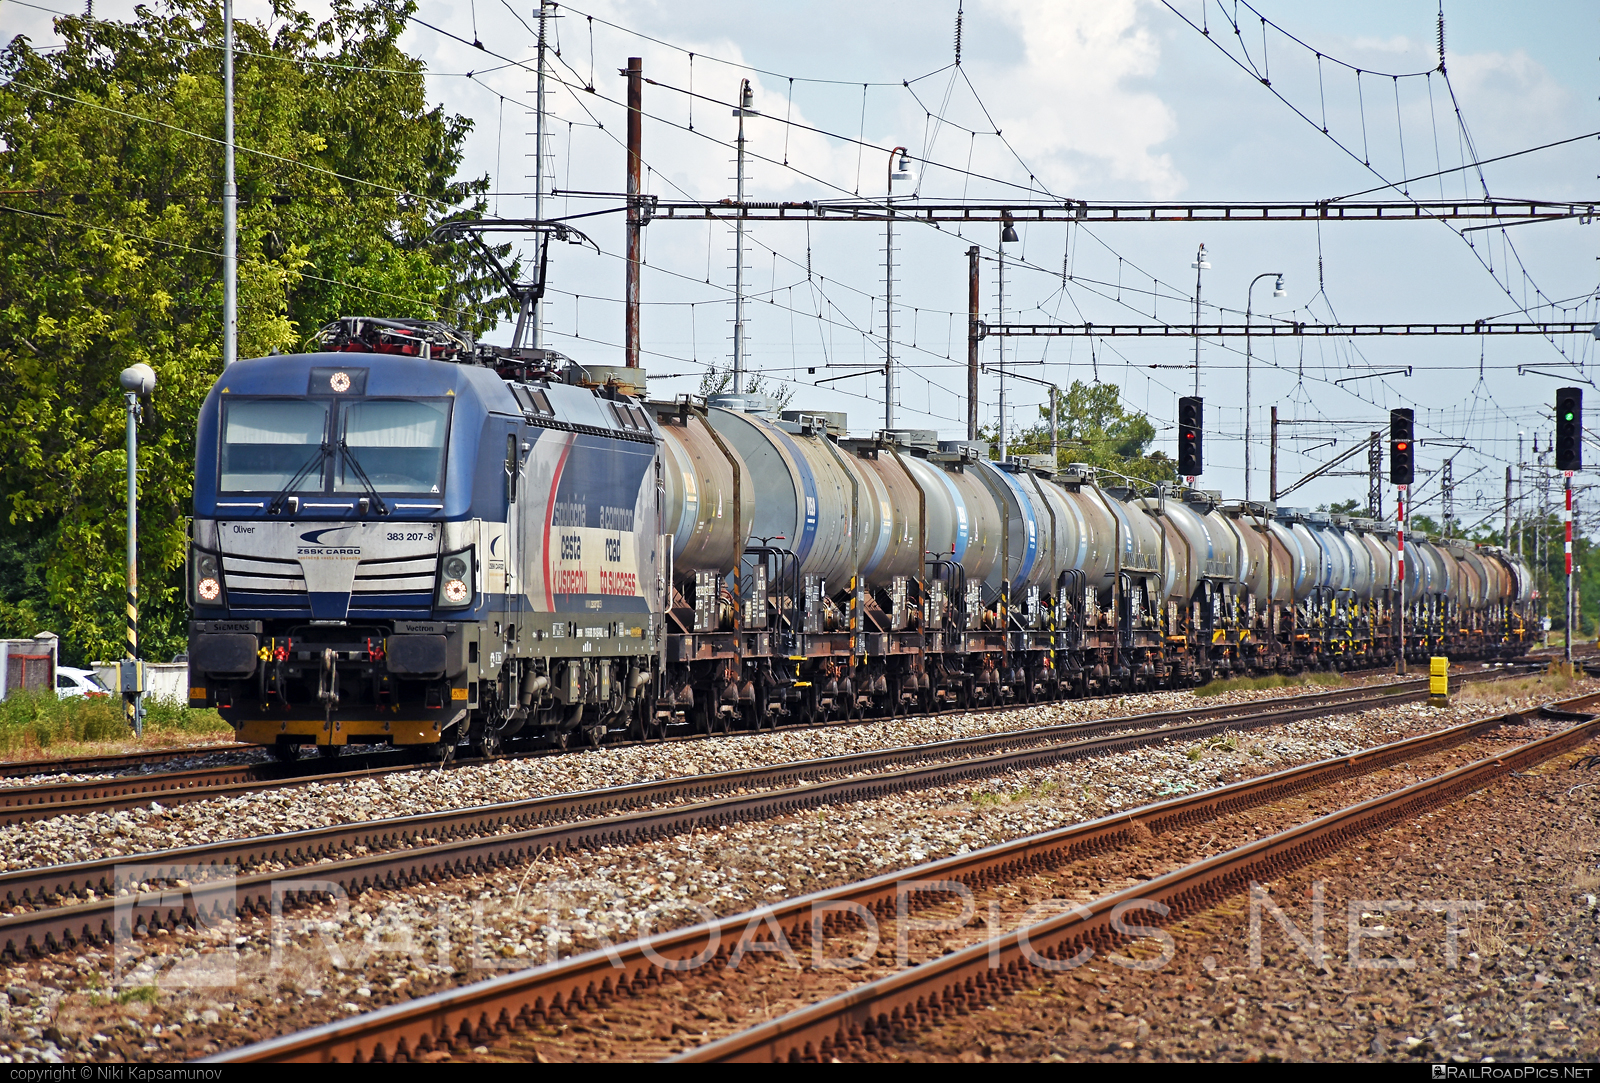 Siemens Vectron MS - 383 207-8 operated by Železničná Spoločnost' Cargo Slovakia a.s. #RollingStockLease #RollingStockLeaseSro #ZeleznicnaSpolocnostCargoSlovakia #duslo #kesselwagen #raill #siemens #siemensvectron #siemensvectronms #tankwagon #vectron #vectronms #zsskcargo